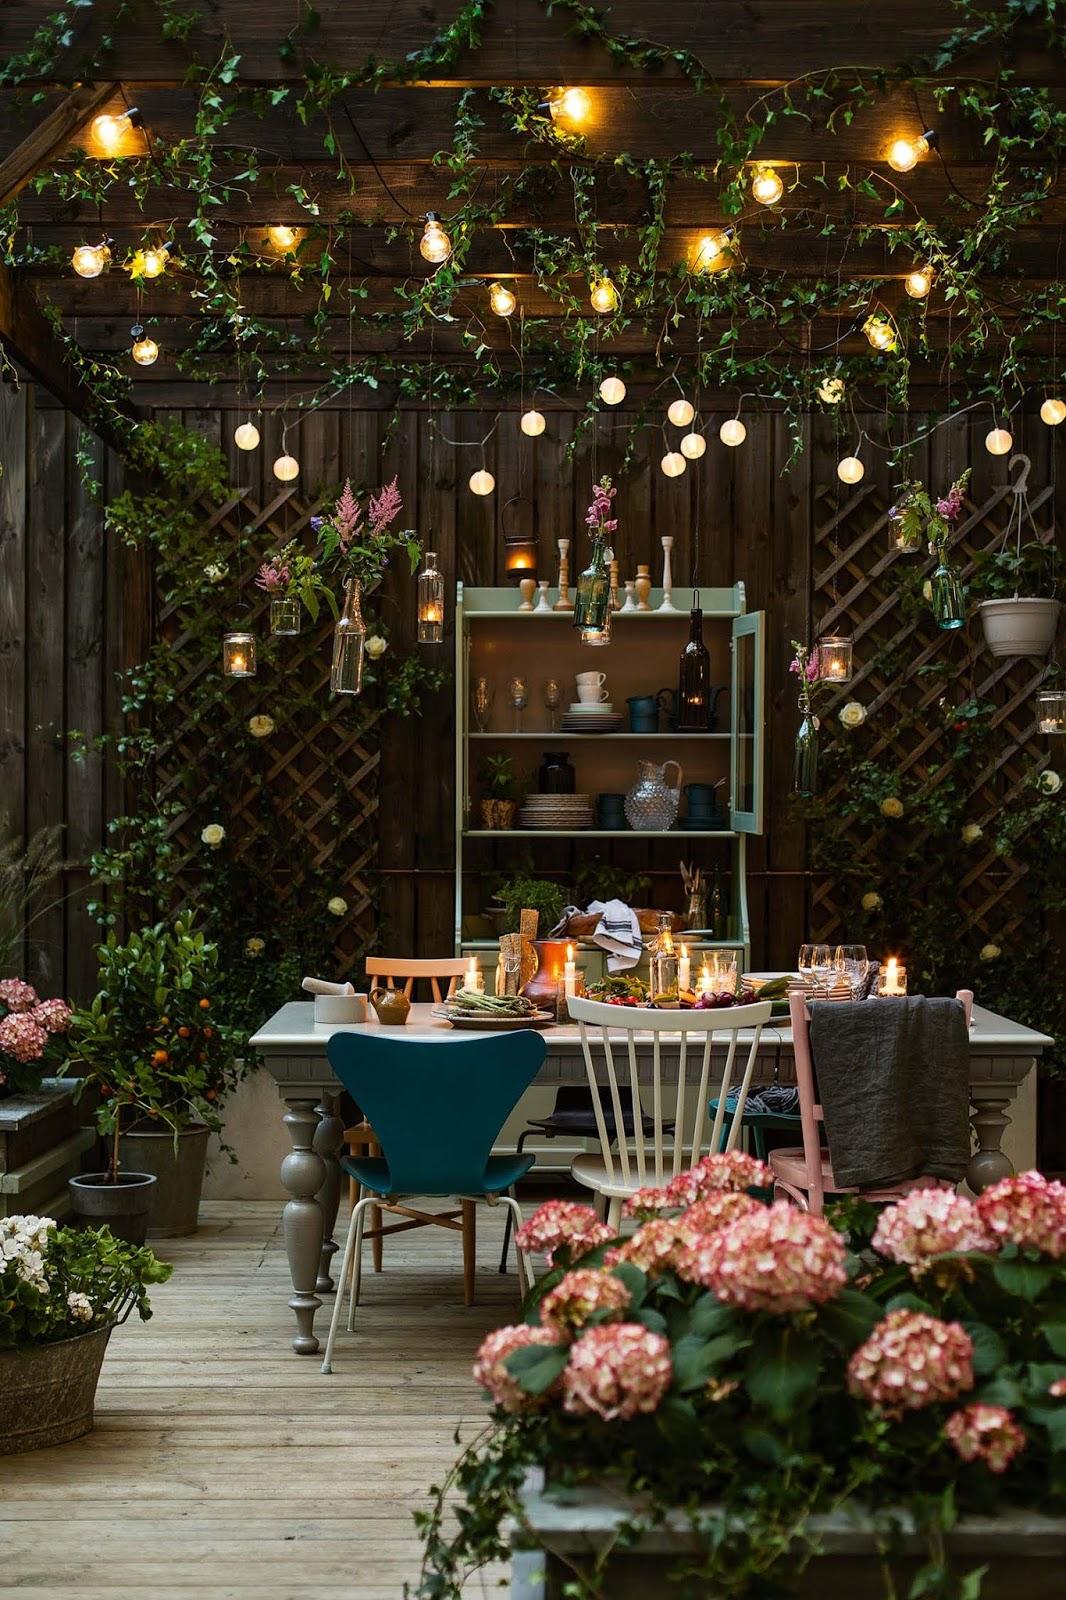 https://1.bp.blogspot.com/-Alw9DEaIwSM/WnLzfKw4rTI/AAAAAAAAWuw/B6F-k2iaiZkMHnYZCYwP7vzFttgljeWwQCLcBGAs/s1600/Bohemian-Garden-Design-Ideas-01-1-Kindesign.jpg